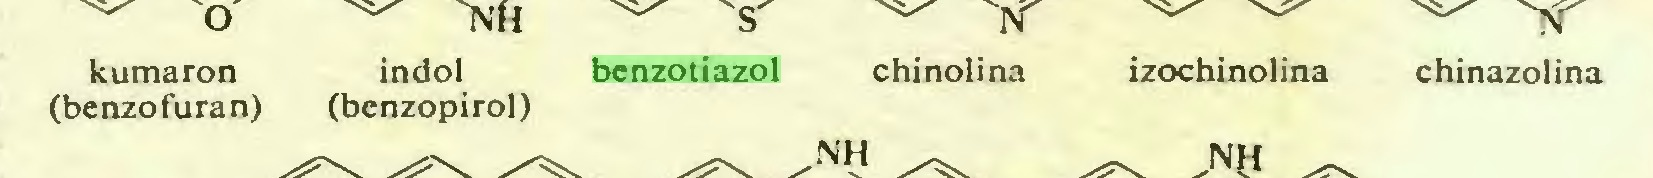 (...) kumaron indol benzotiazol chinolina izochinolina chinazolina (benzofuran) (benzopirol)...